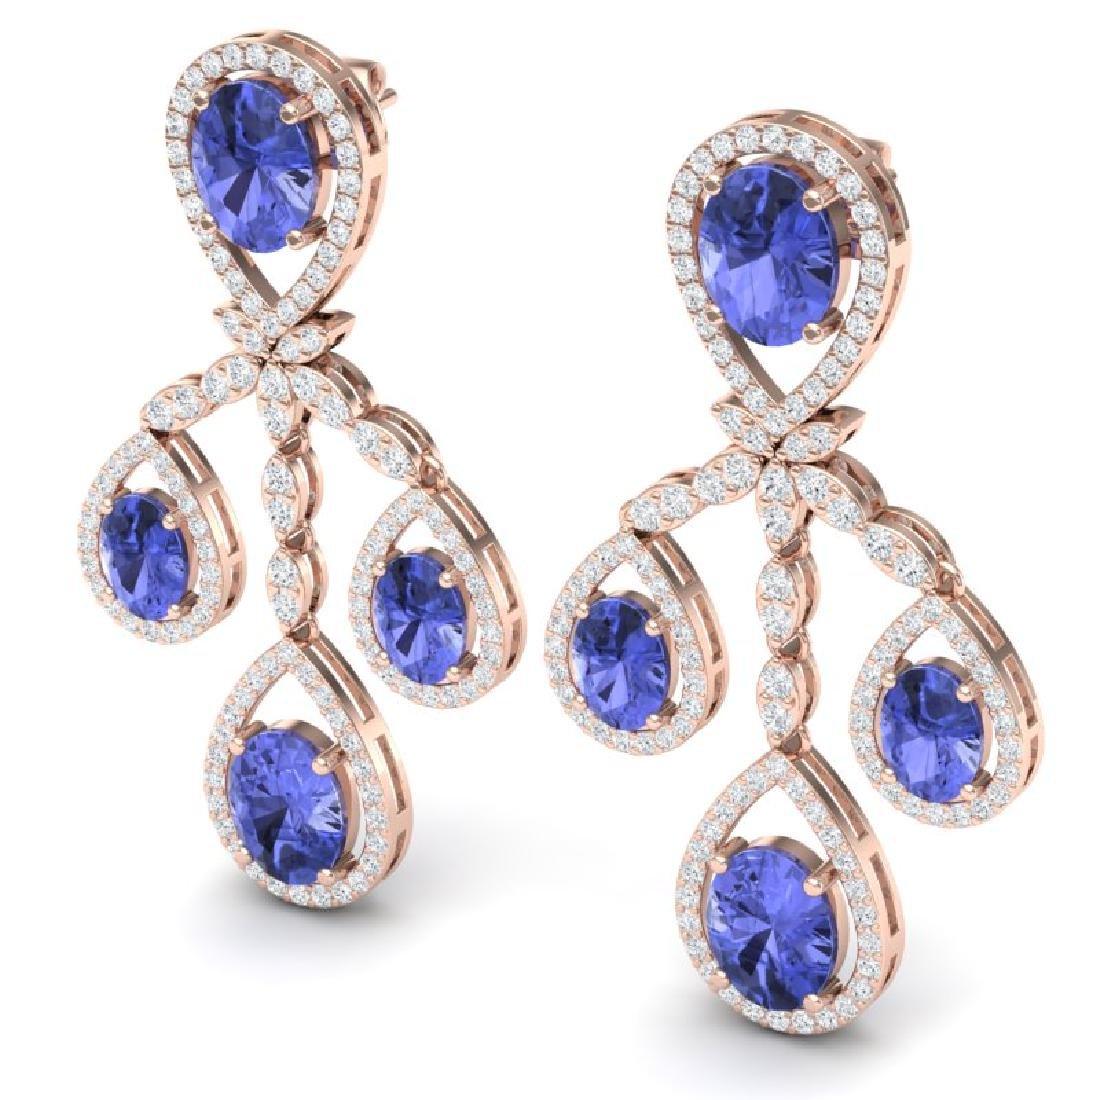 24.89 CTW Royalty Tanzanite & VS Diamond Earrings 18K - 2